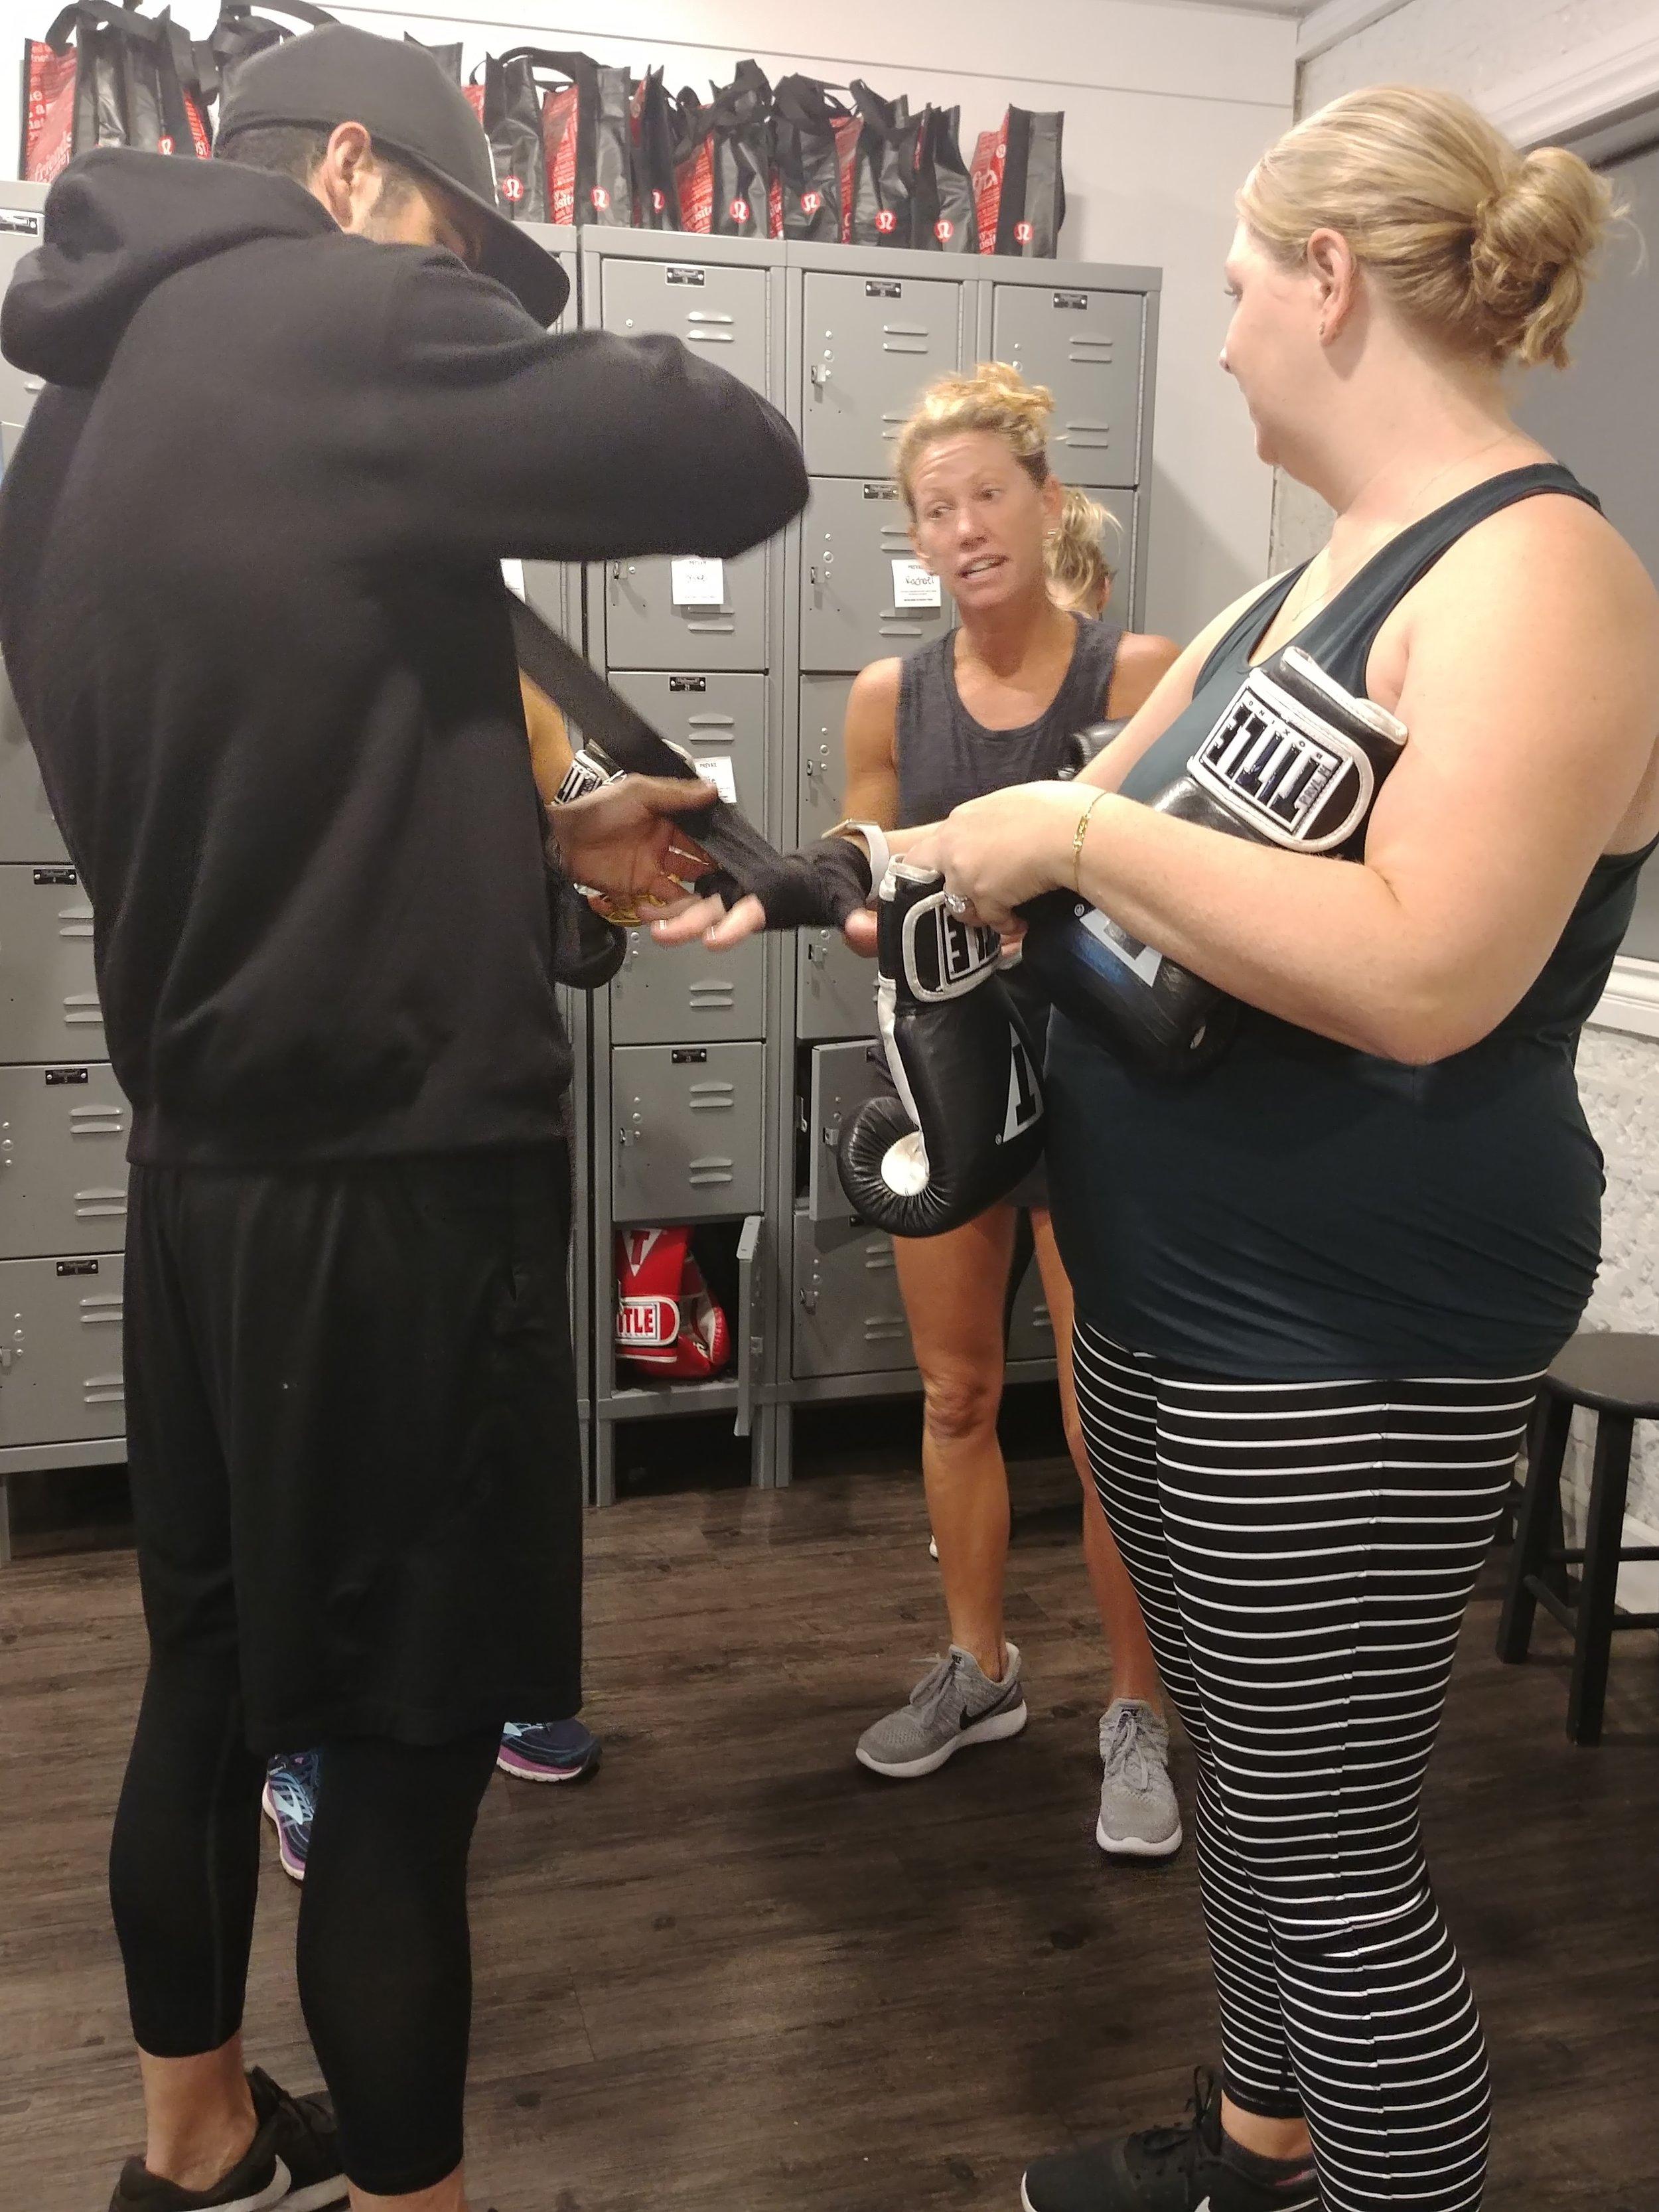 Fuel Yoga Workouts Downtown Portland Heated  Yoga Power Vinyasa 826 SW 2nd Ave Portland Oregon 97204 971-213-3835 DILA 17.jpg